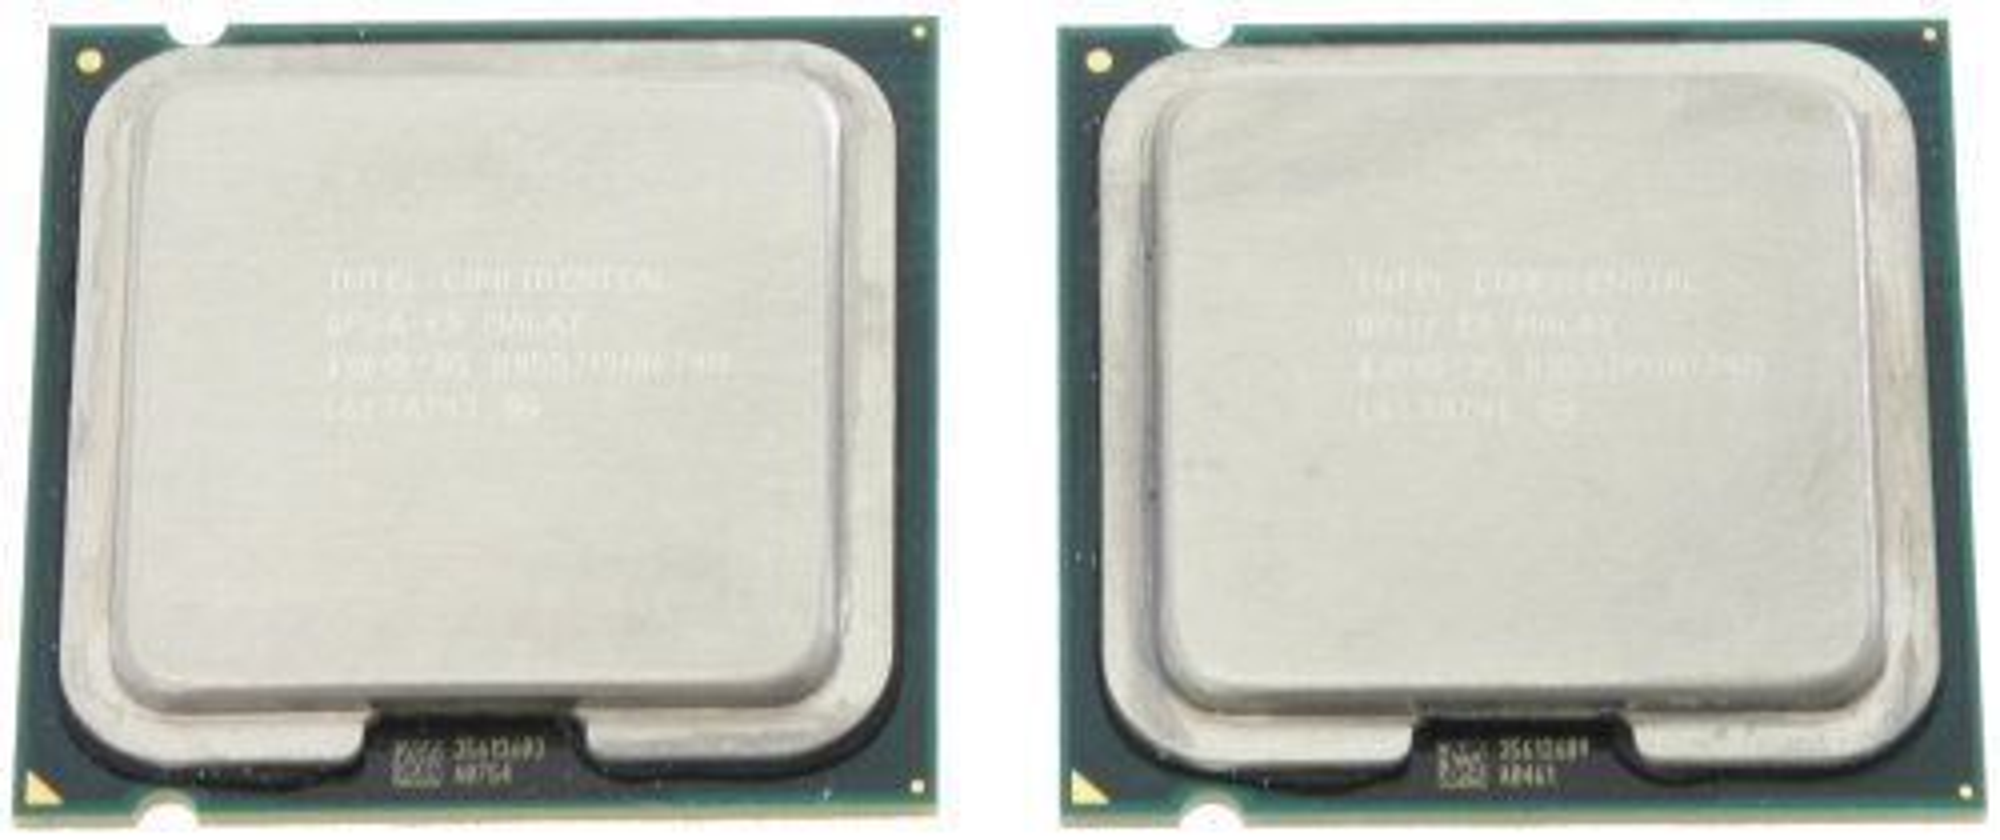 <em>Core 2 Duo E6700 til venste, Core 2 Extreme X6800 til høyre.</em>